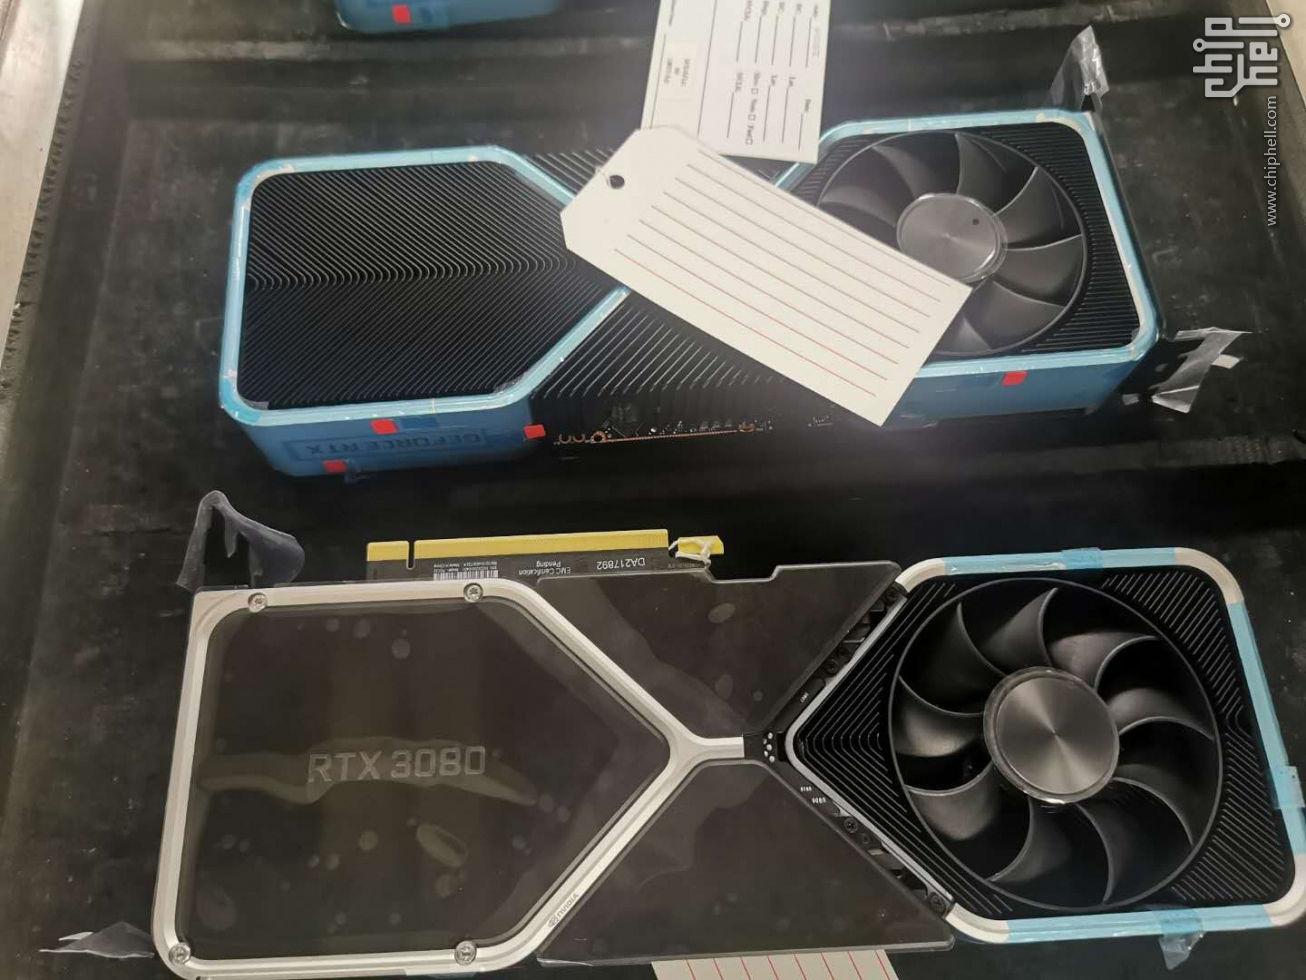 Nvidia RTX 3080 foto (Chiphell)